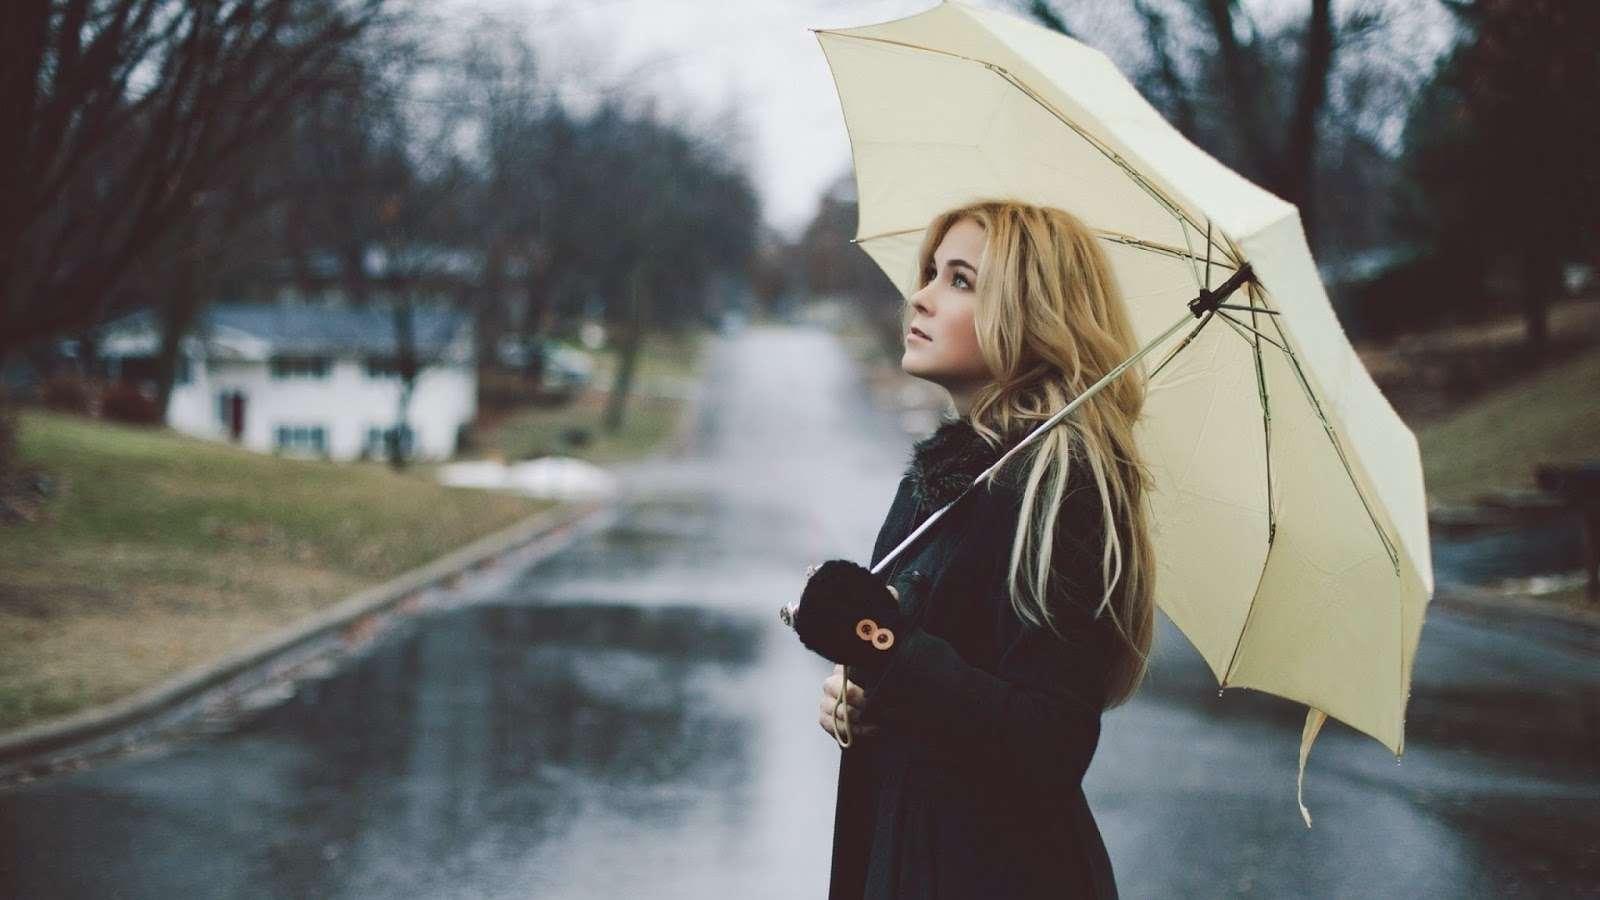 blondes-women-rain-models-umbrellas-1440x2560-Download